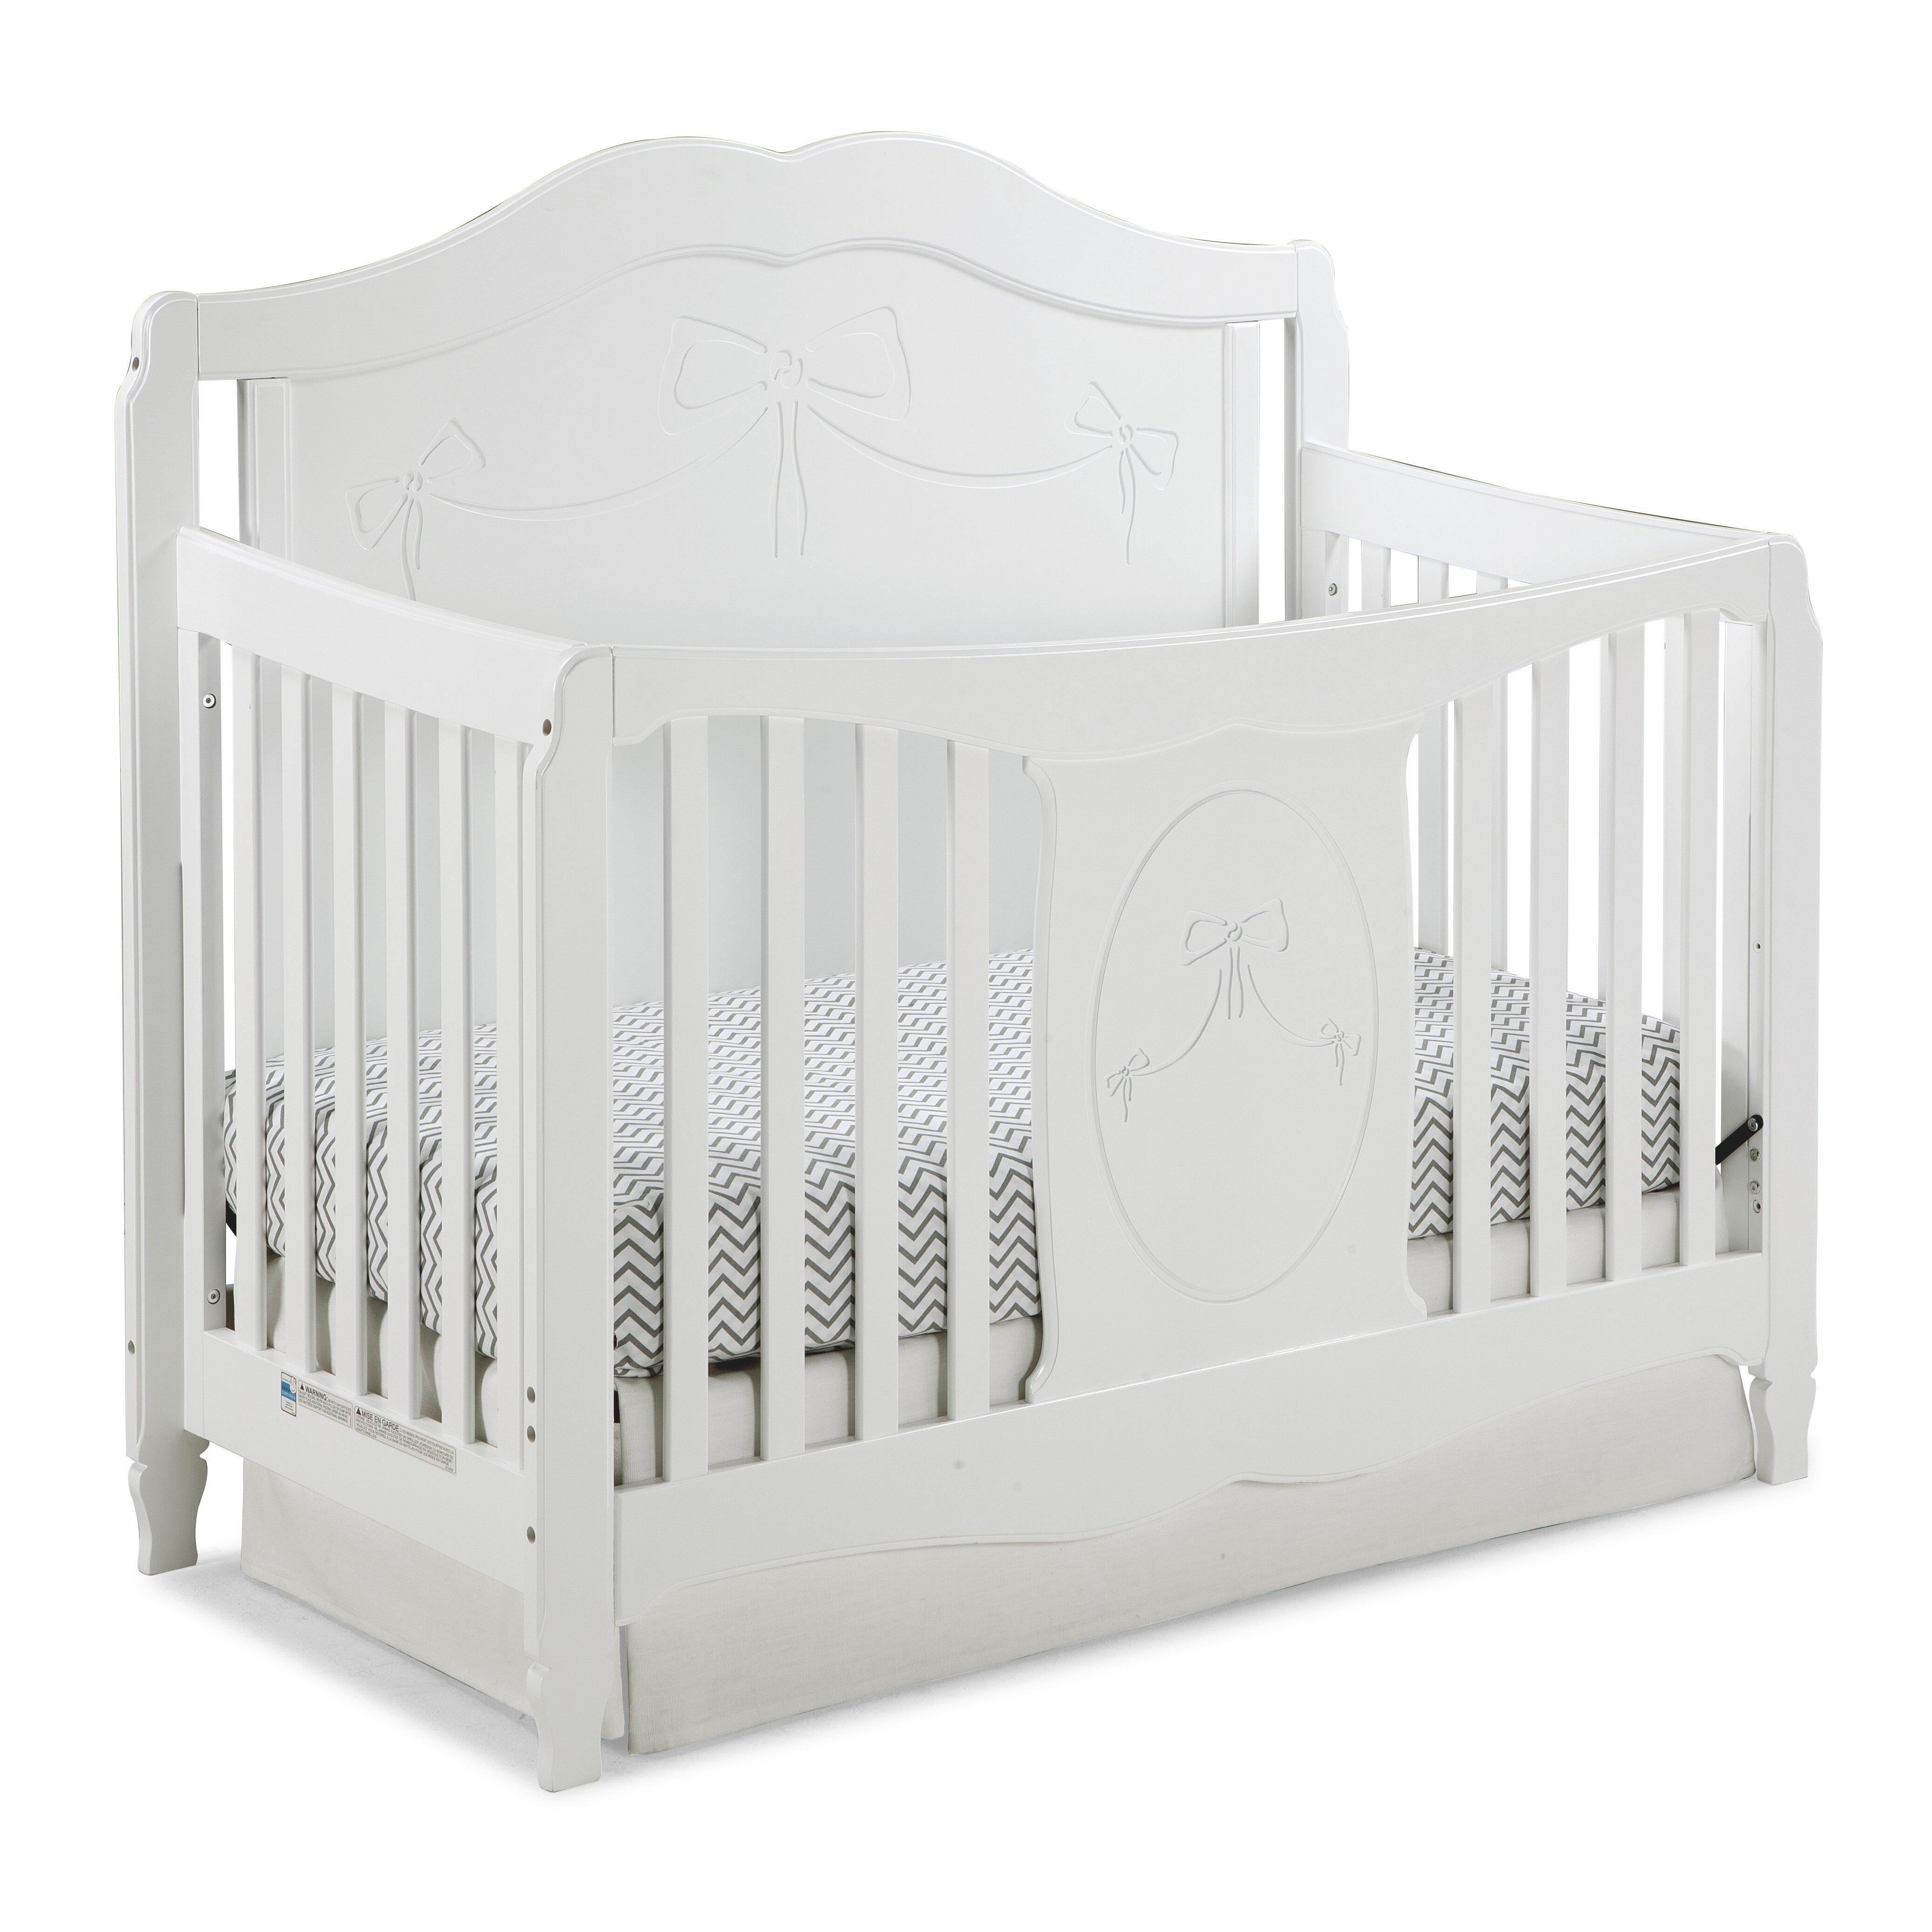 Emma iron crib for sale - Storkcraft Princess Convertible Crib